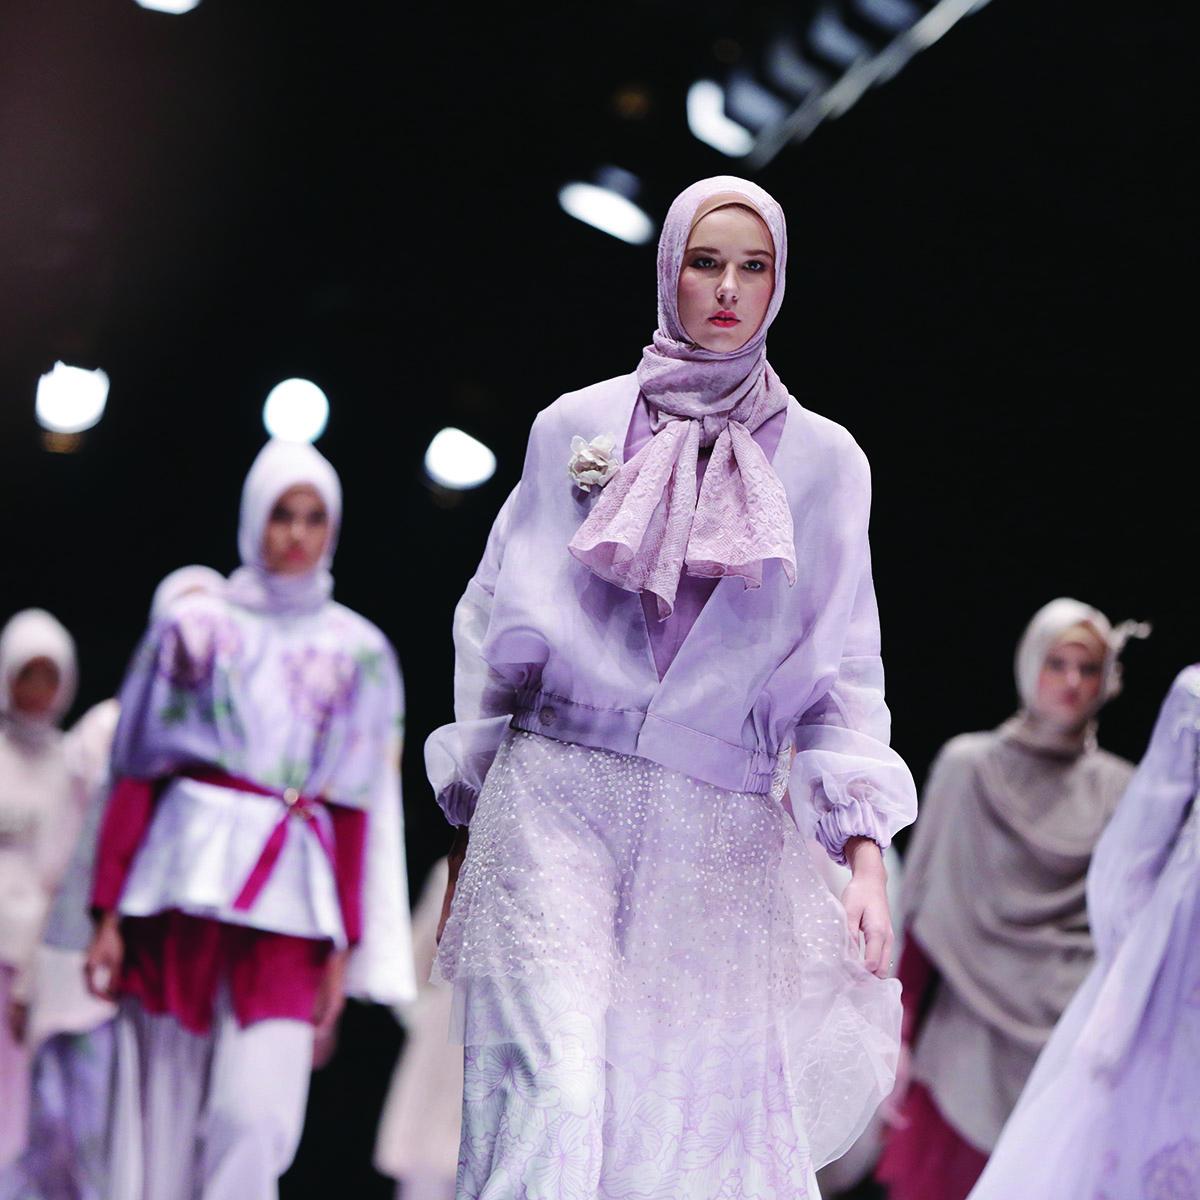 Menginjak Tahun Ke-10, Jakarta Fashion Week Akan Lebih Istimewa